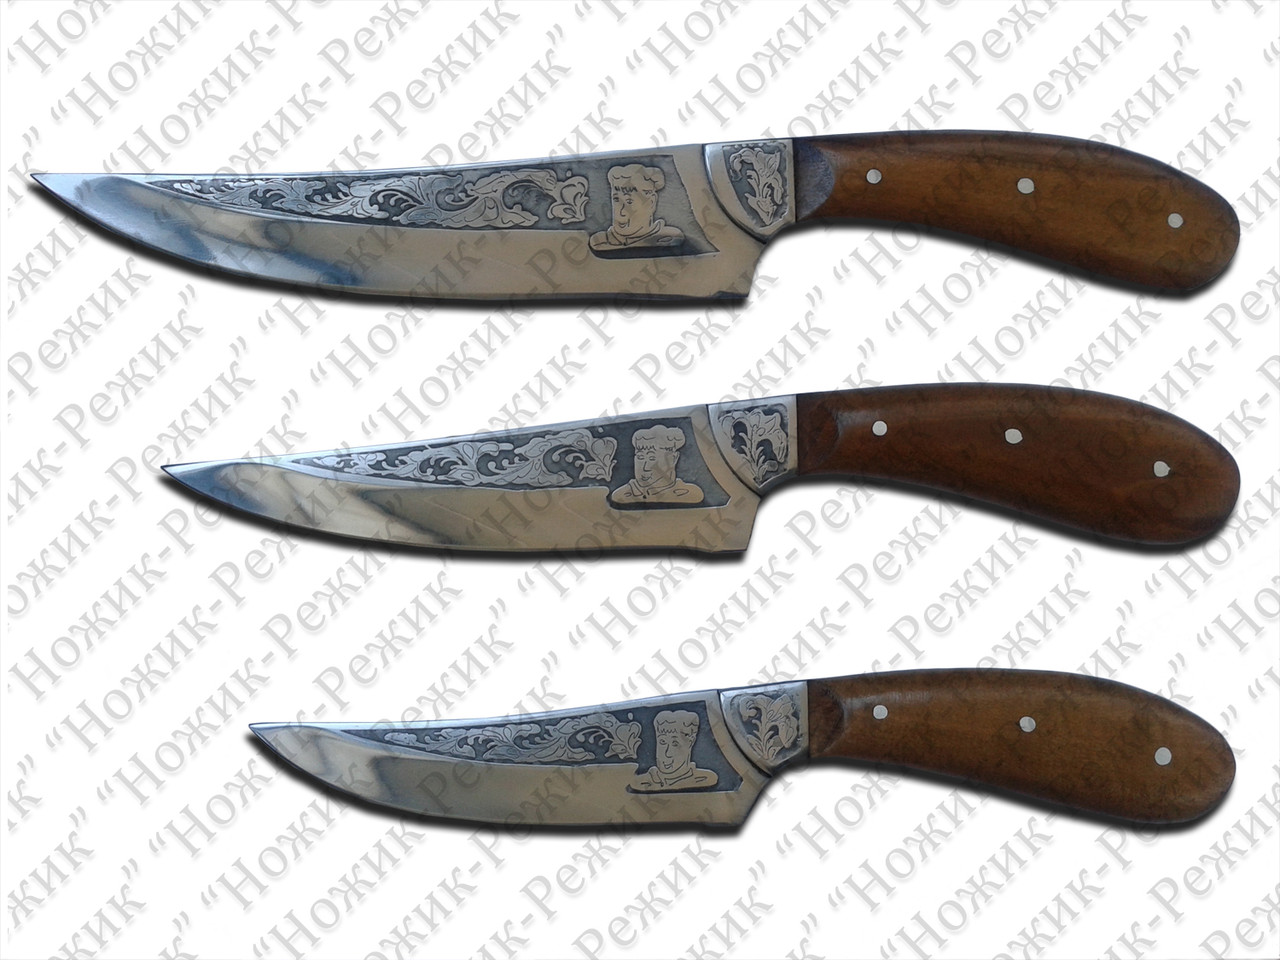 Набор кухонных ножей, нож для разделки мяса, нож для разделки рыбы, нож для кухни, набор ножей для кухни